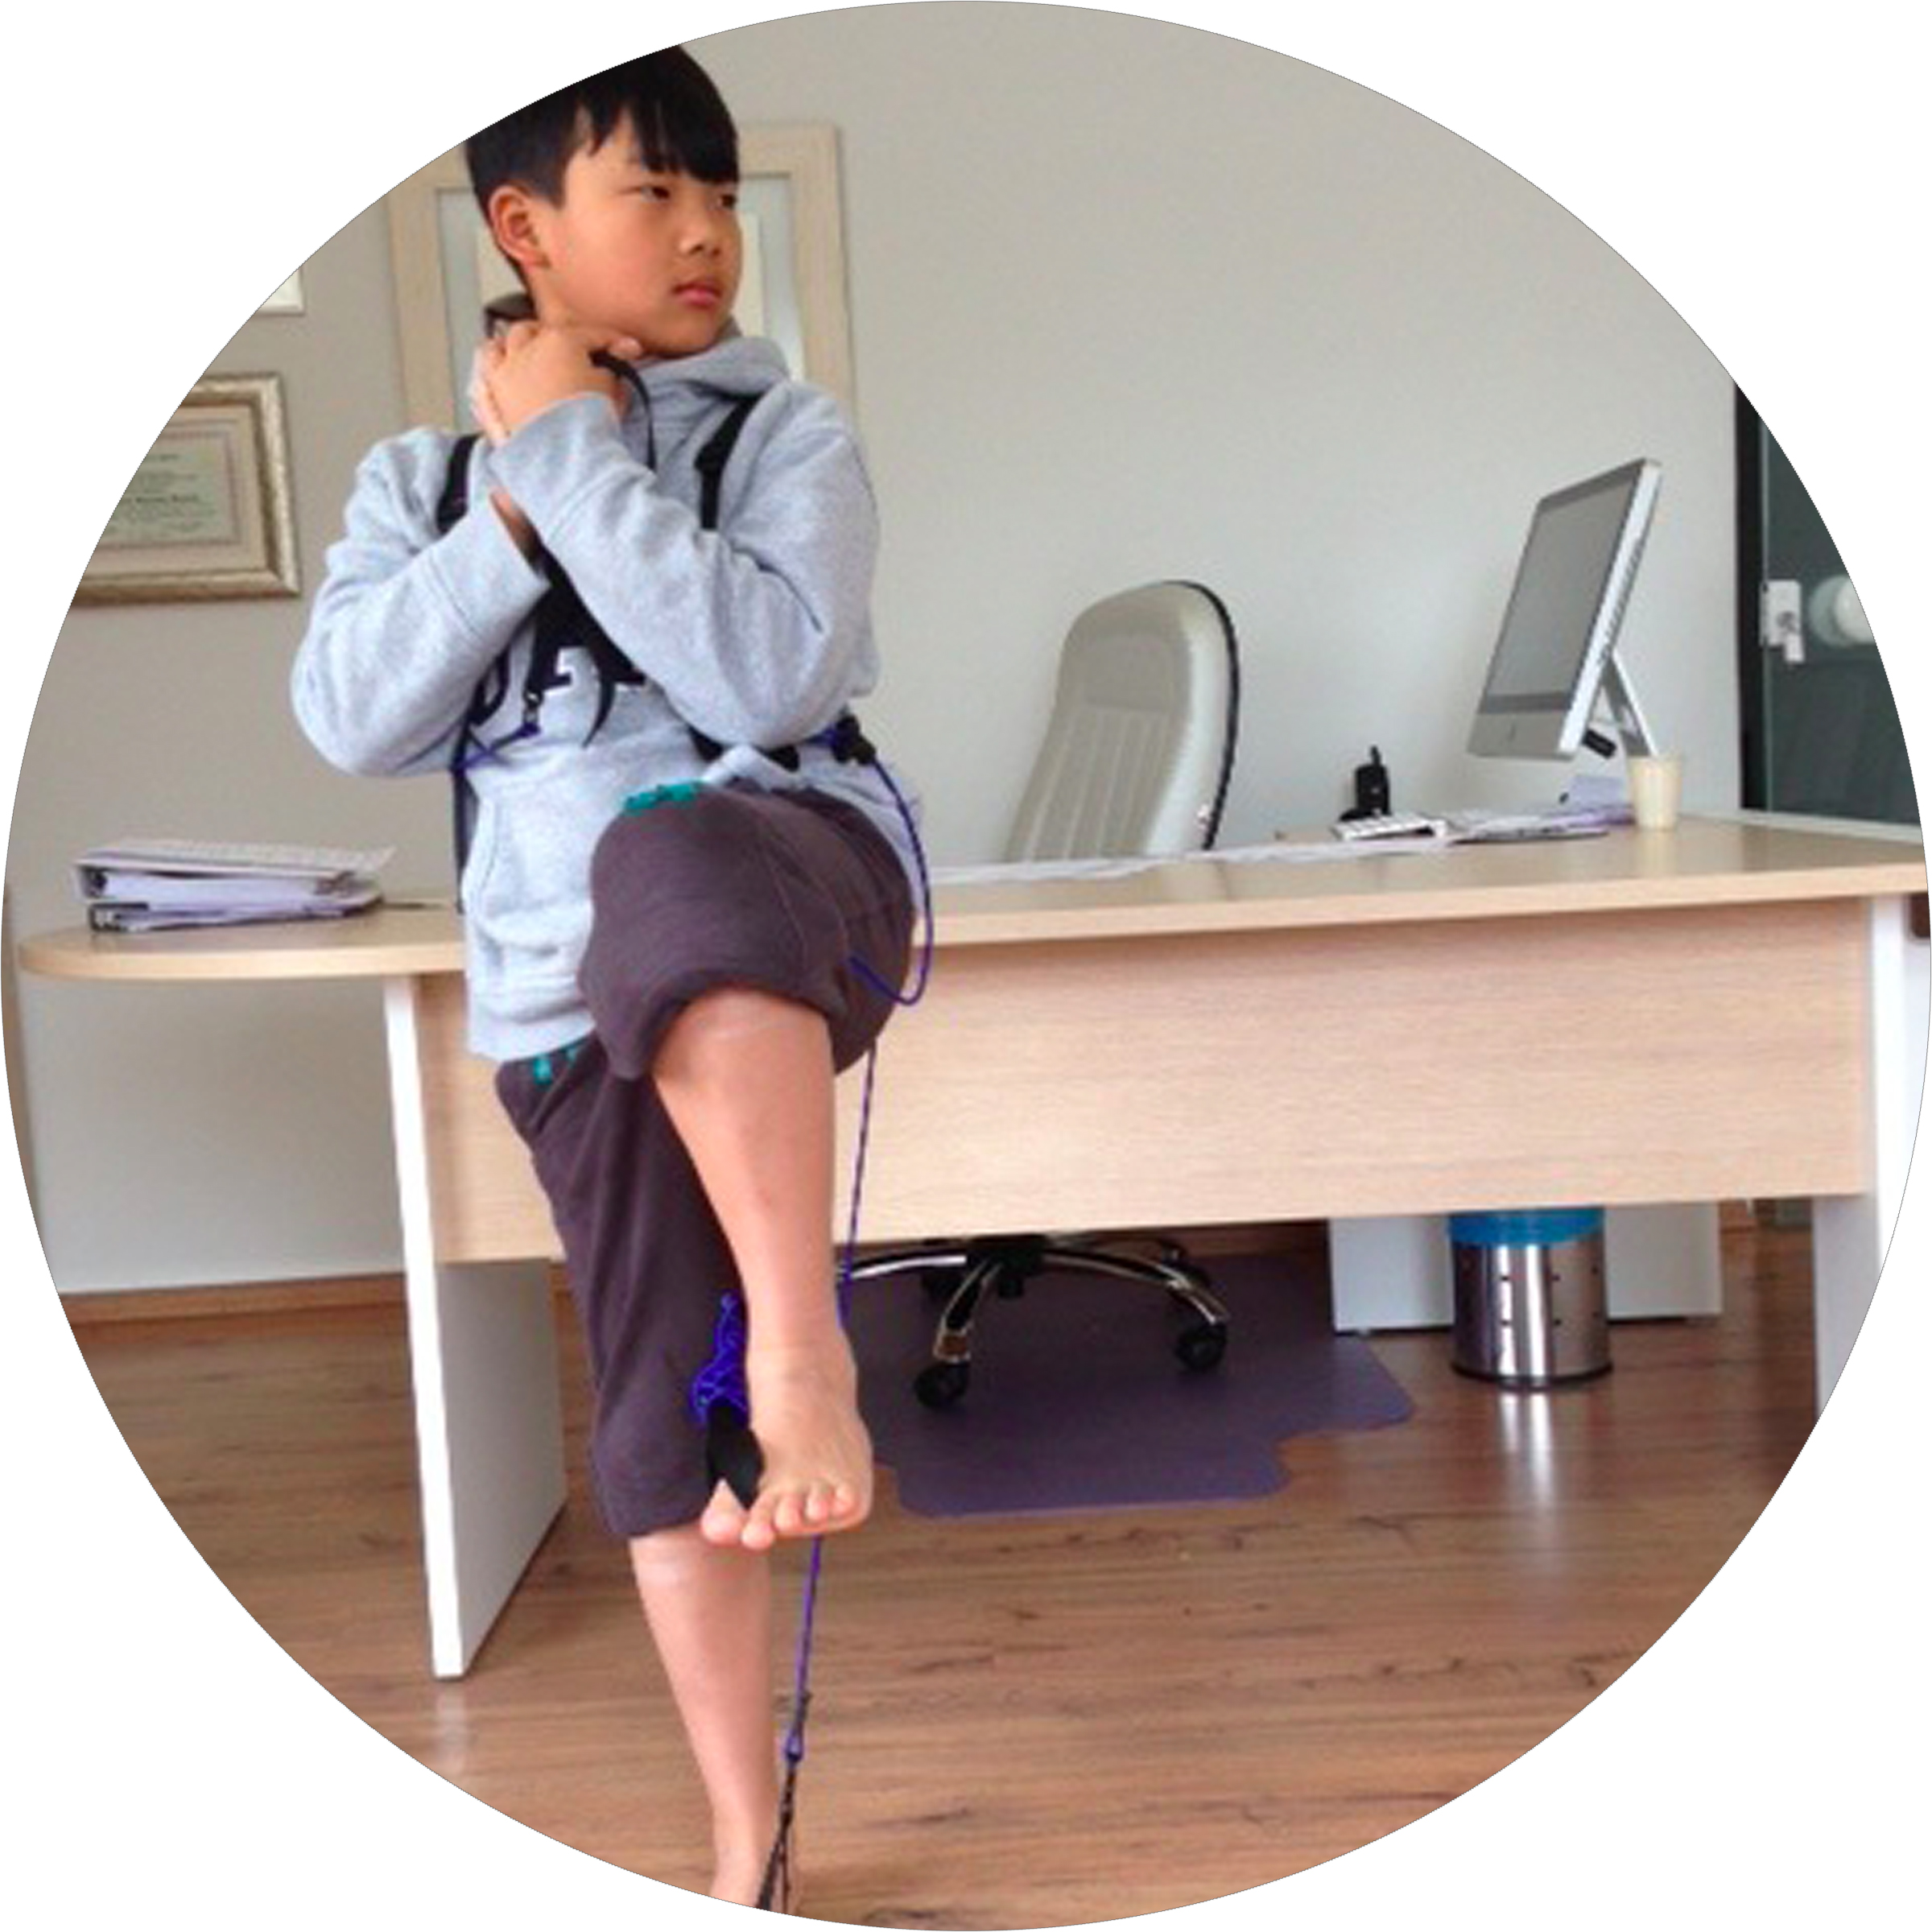 10 Year-old boy practicing baseball movements with Tye4®, Brazil.